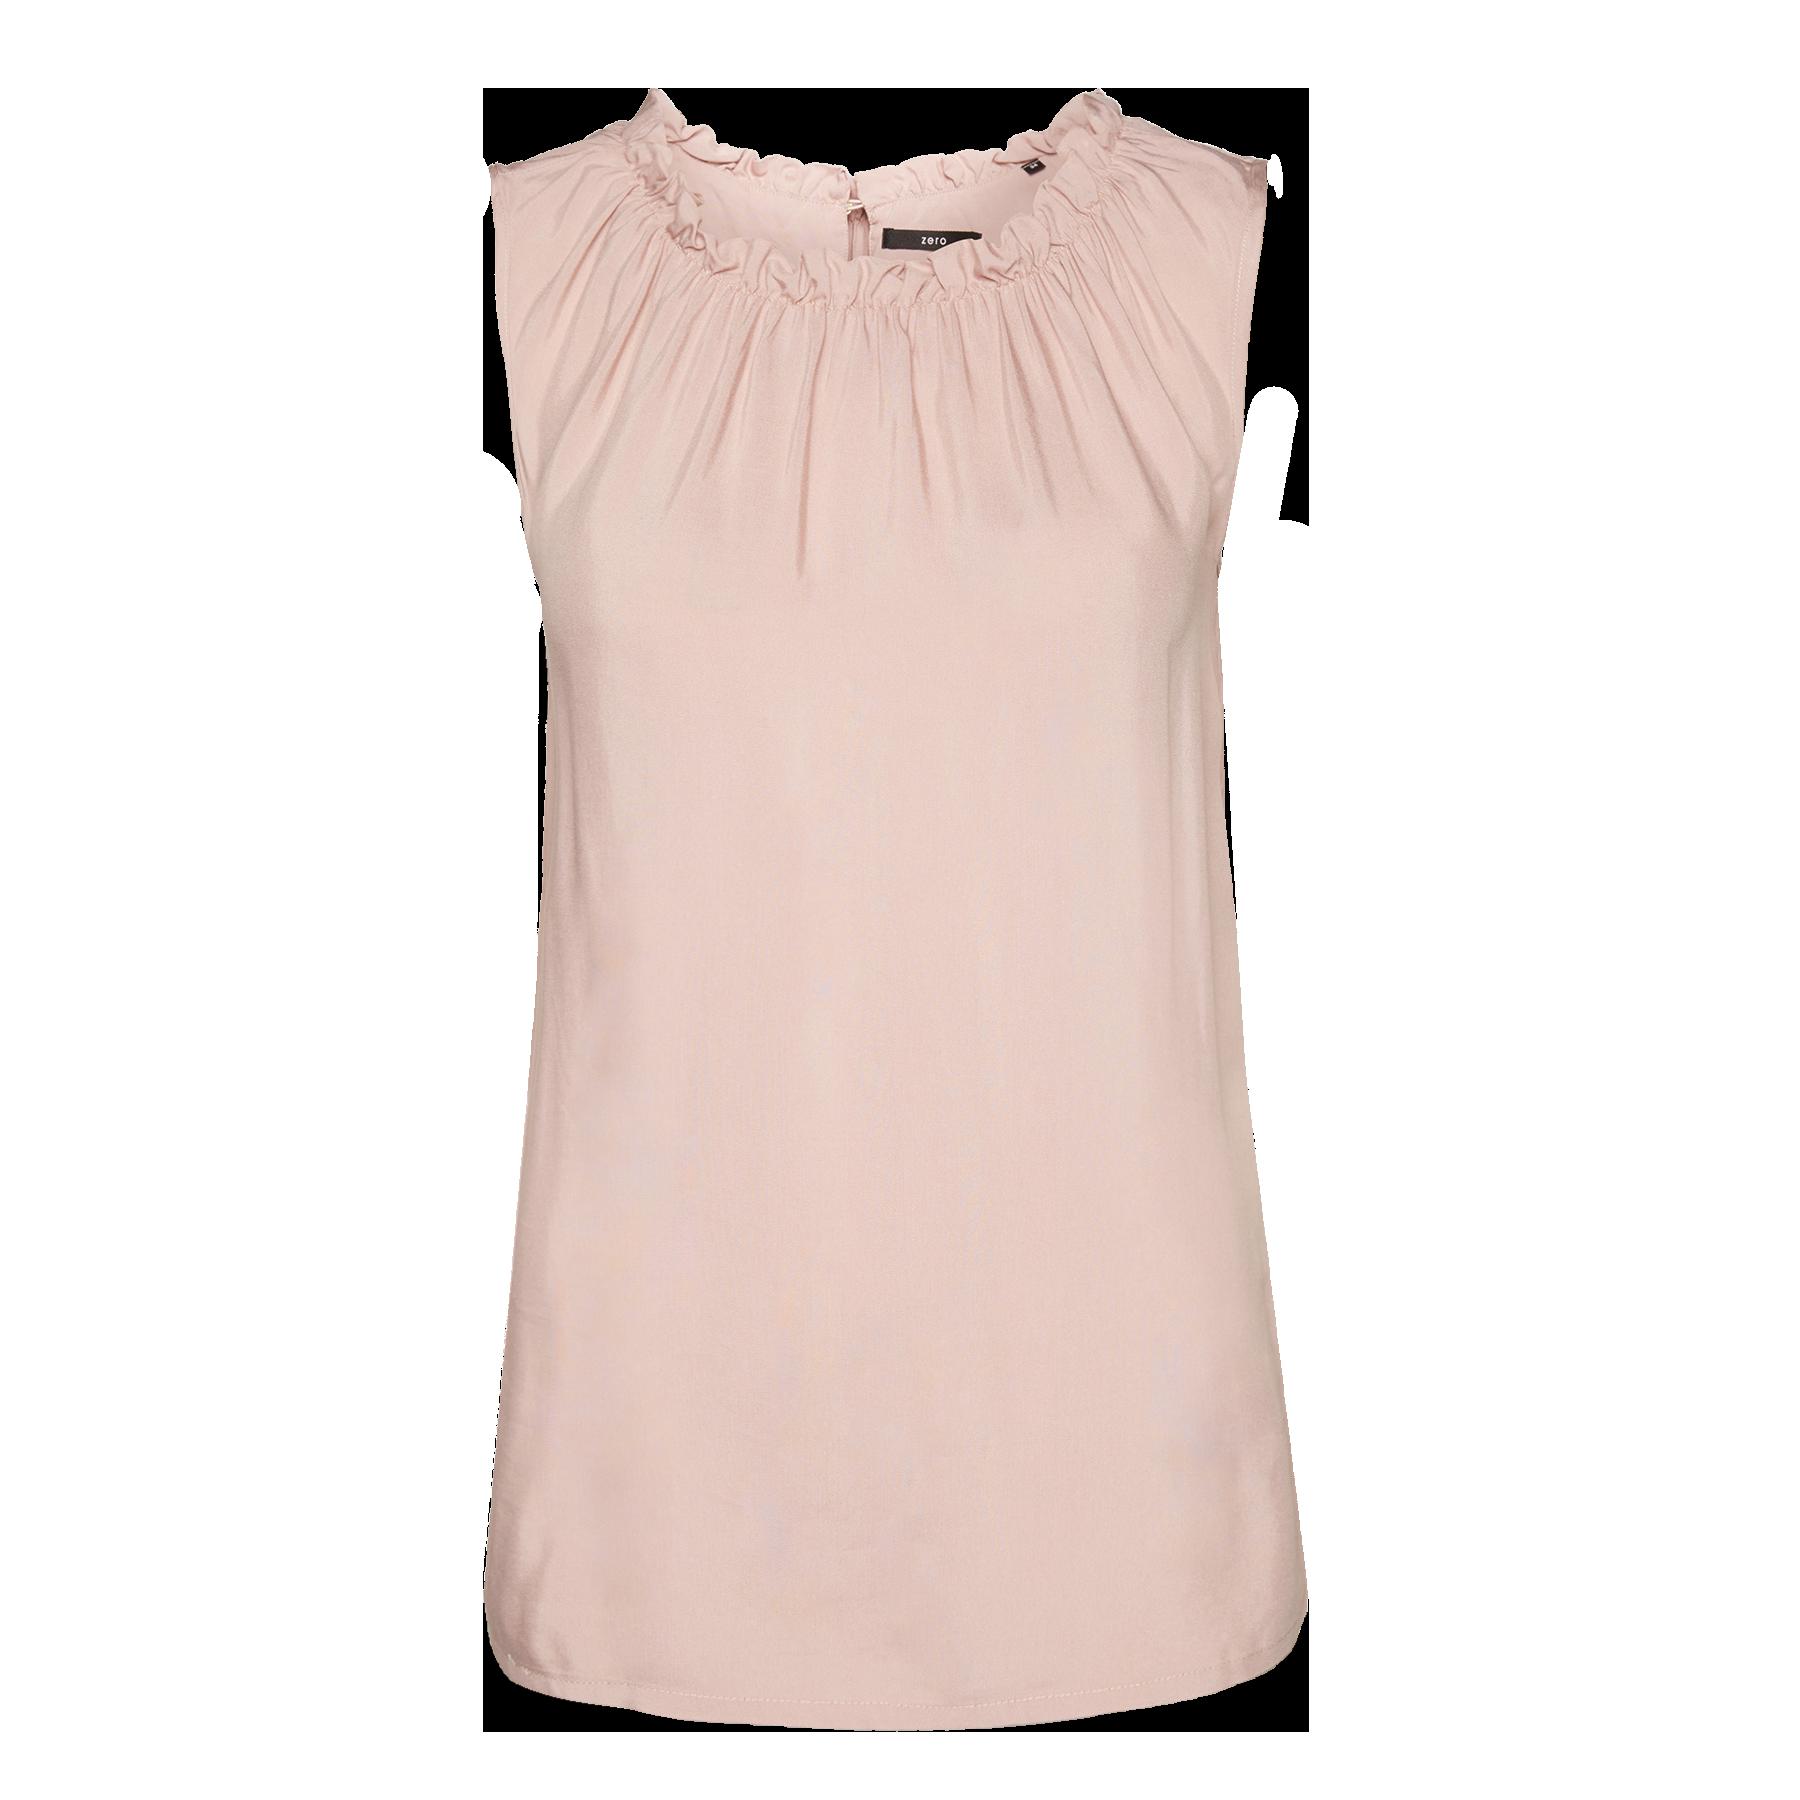 Bluse mit gerüschtem Kragen light woodrose